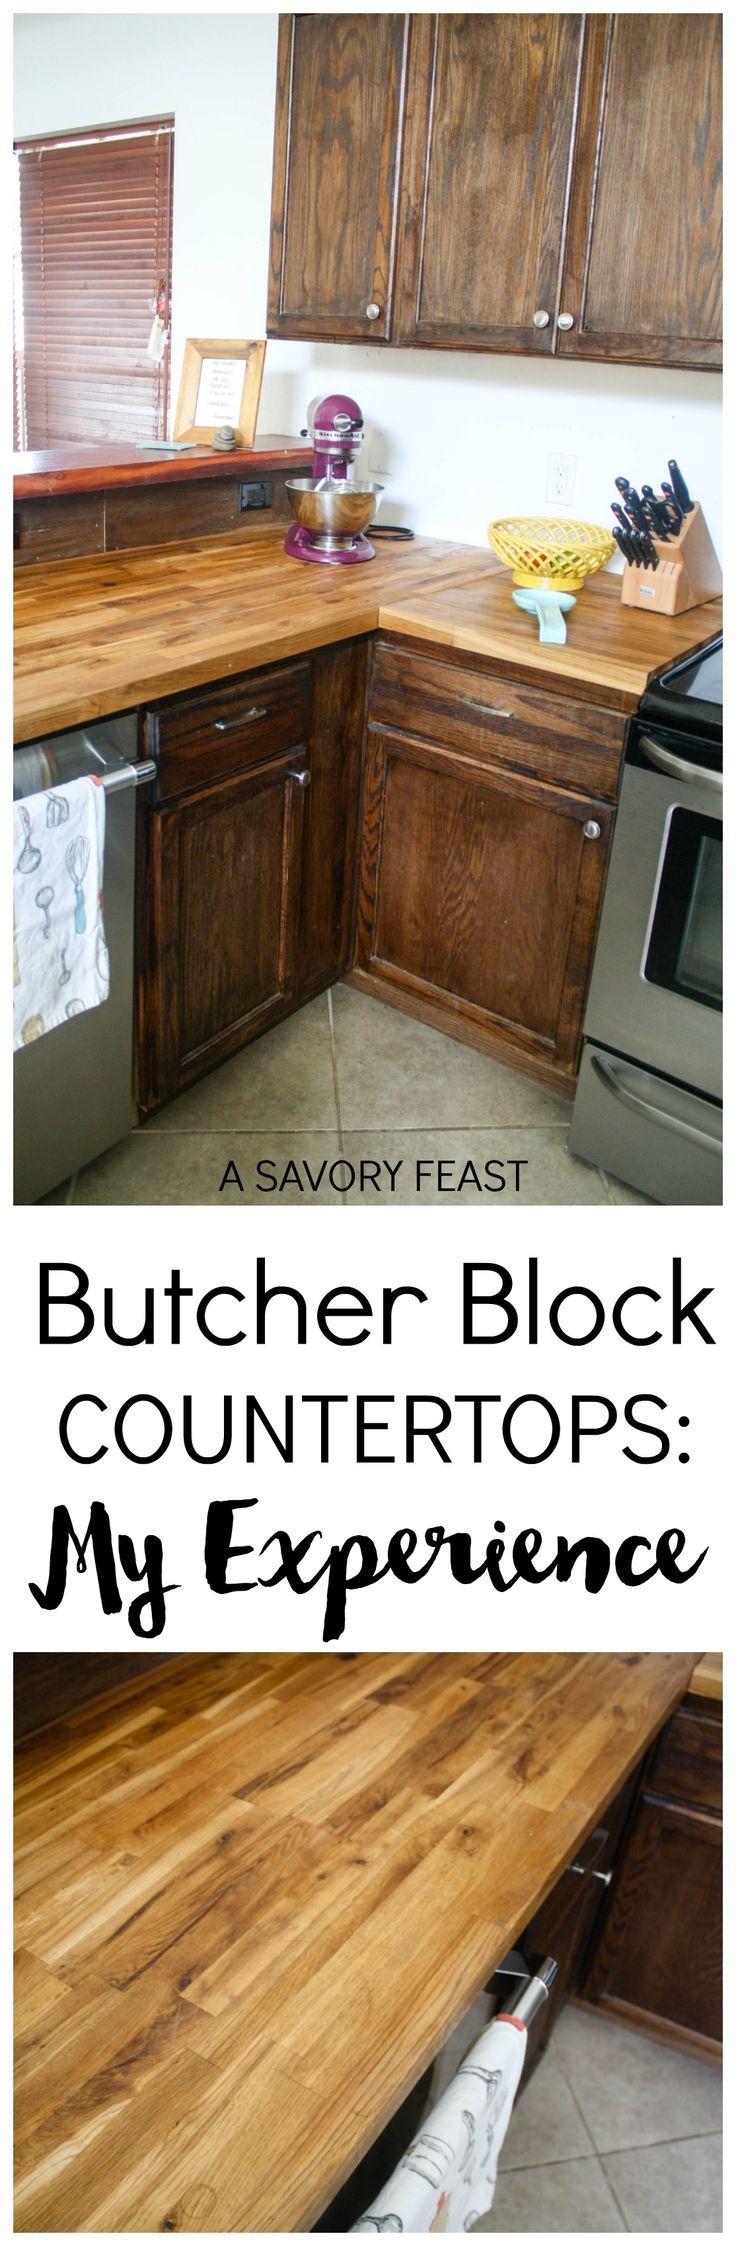 butcher block countertops my experience crafts butcher